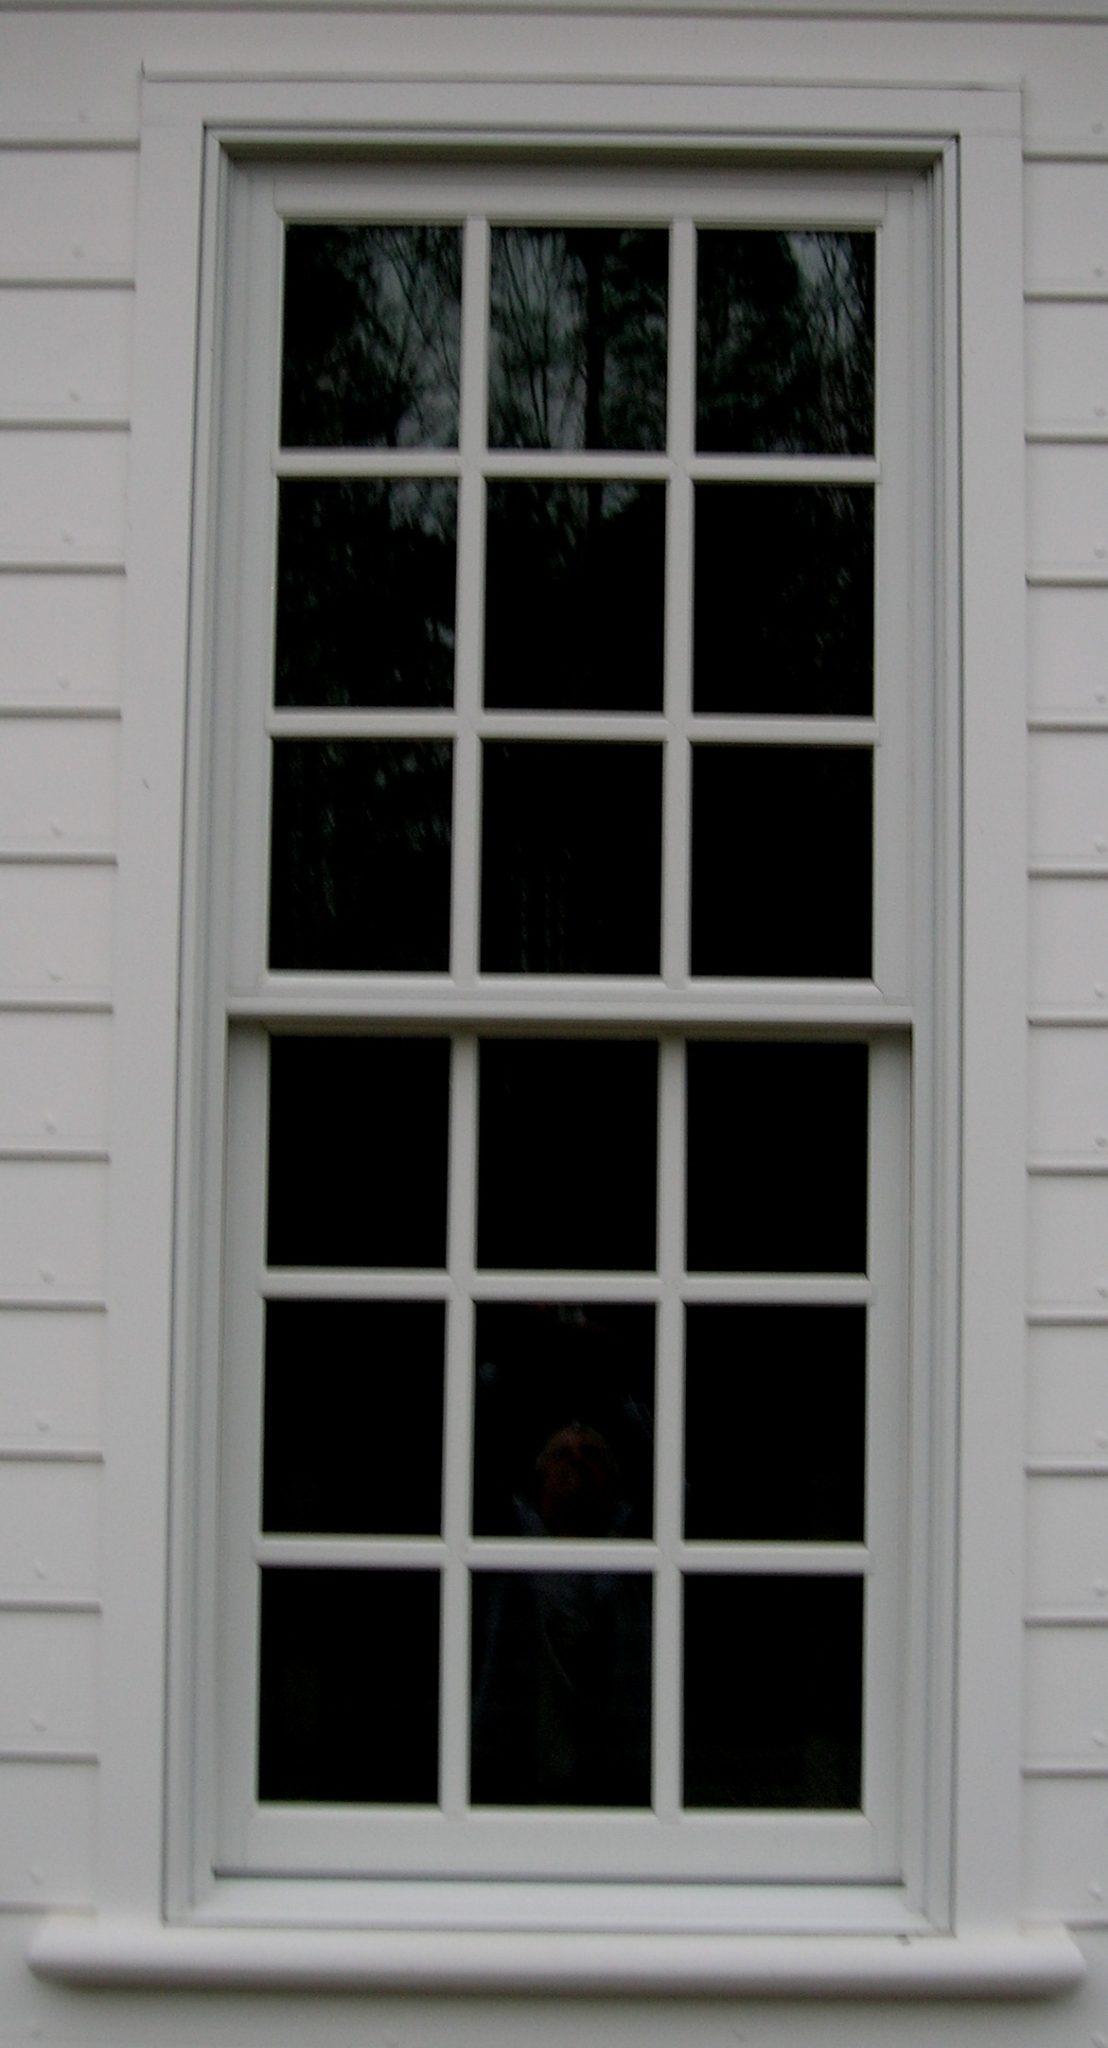 Colonial House Part 6 Gracefield Hall L L C